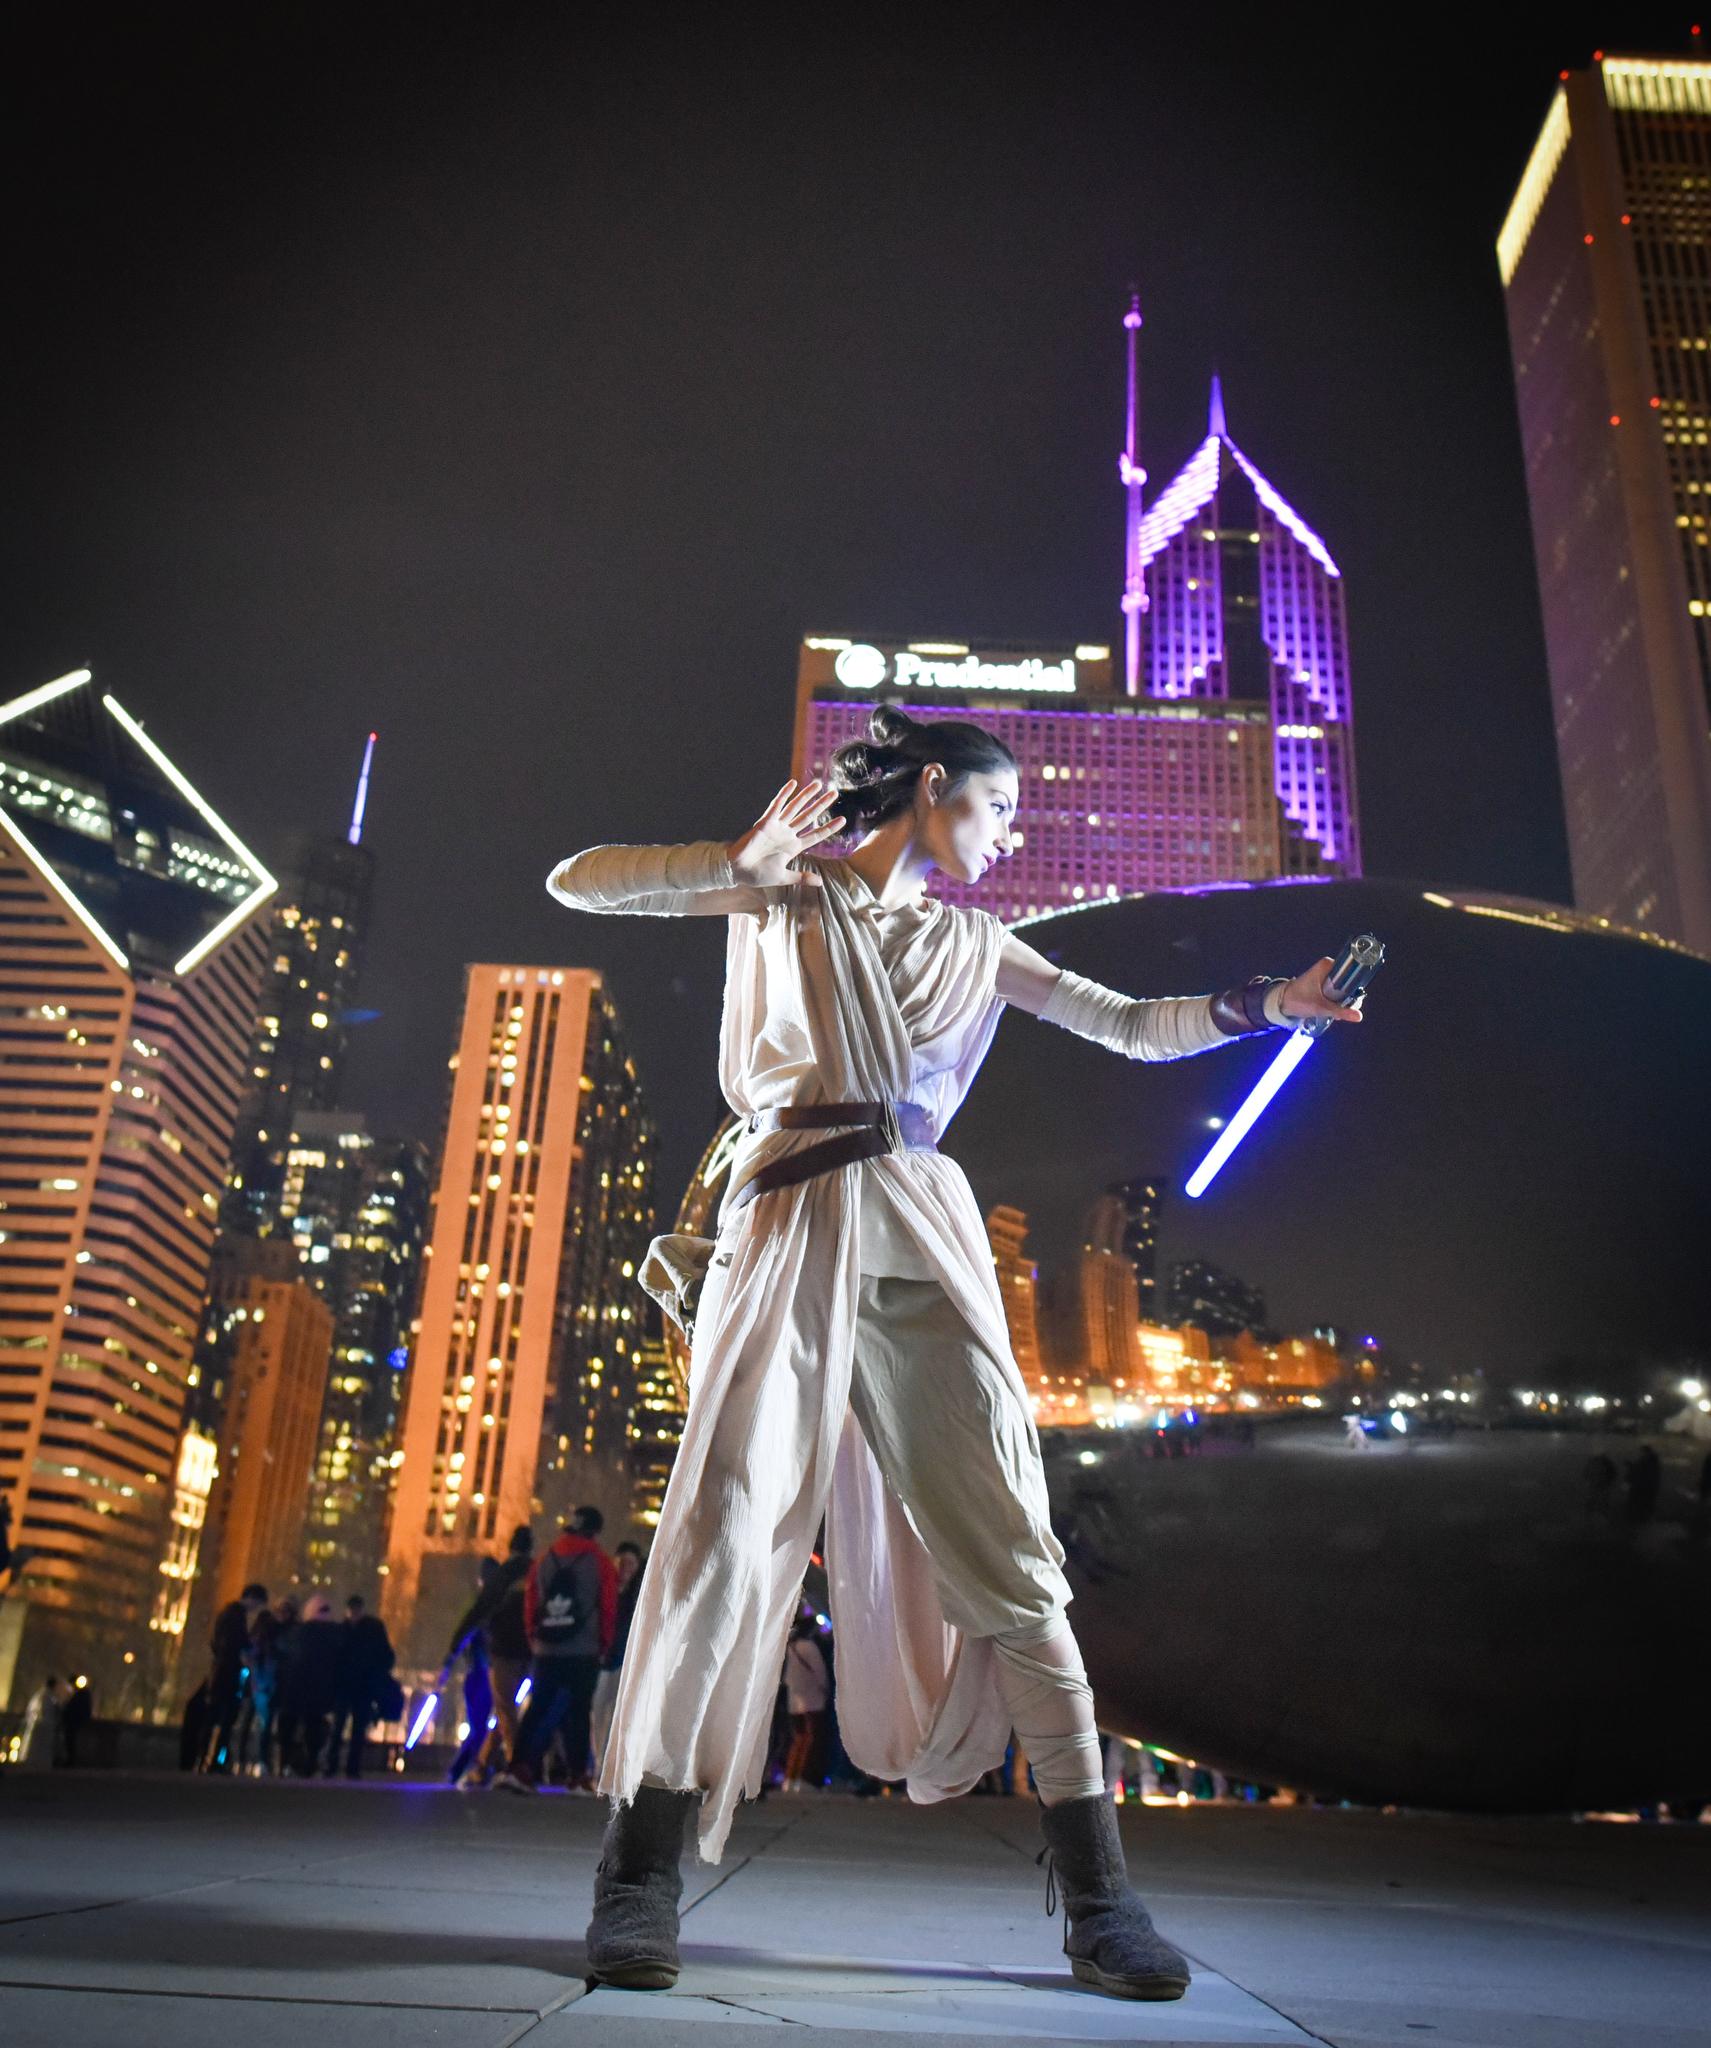 2019.04.14 - Star Wars Celebration Chicago 288897.JPG